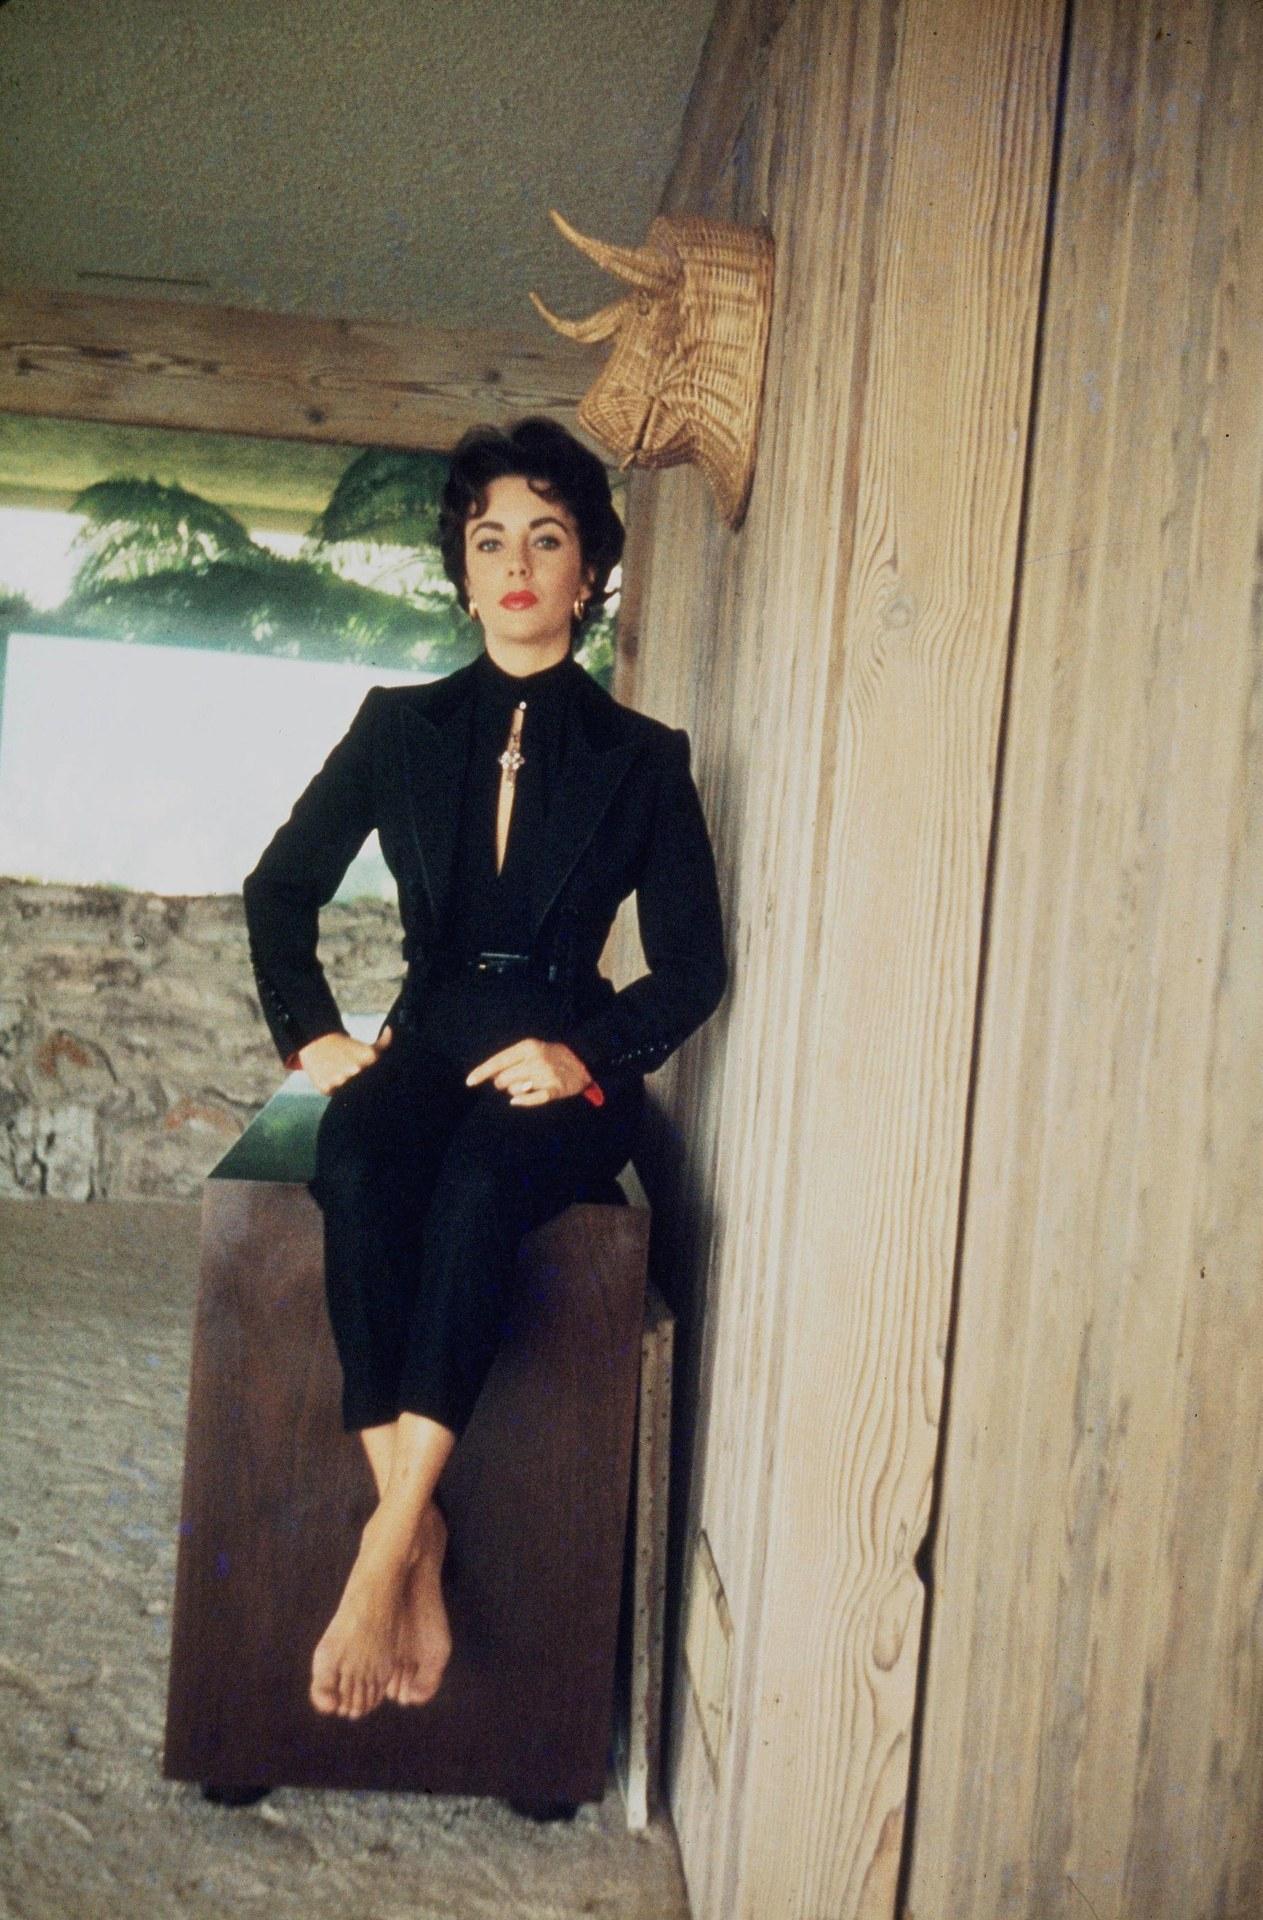 https://pics.wikifeet.com/Elizabeth-Taylor-Feet-973389.jpg